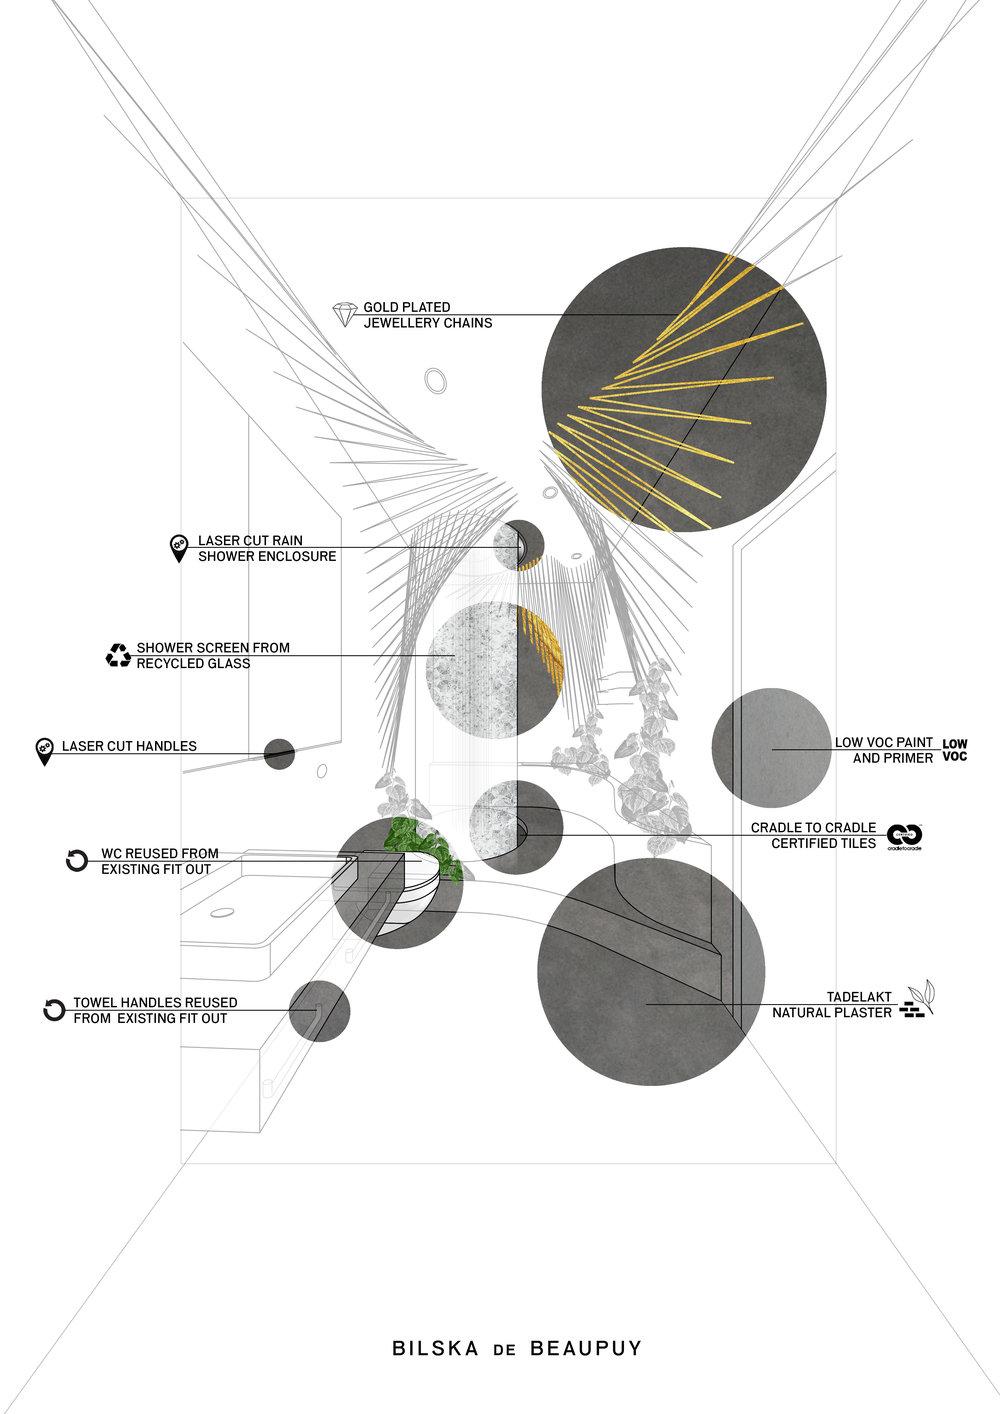 sustainable materials by Bilska de Beaupuy.jpg